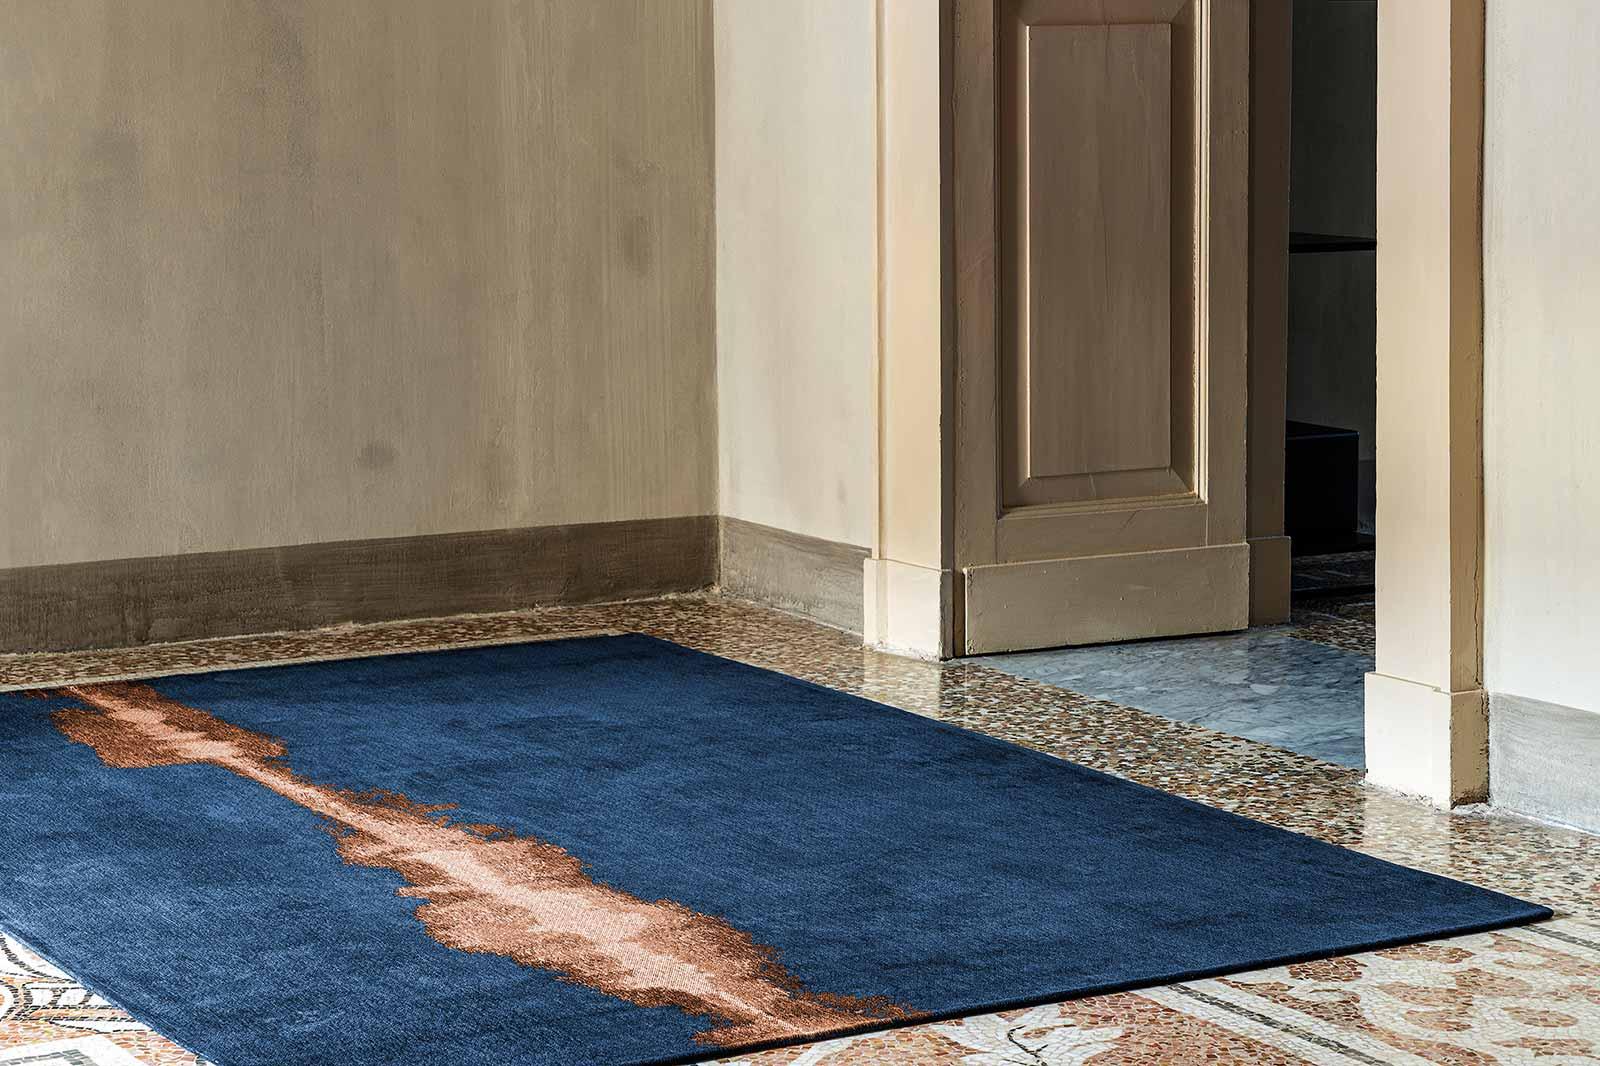 Louis De Poortere teppich Fischbacher Linares 9056 interior 2